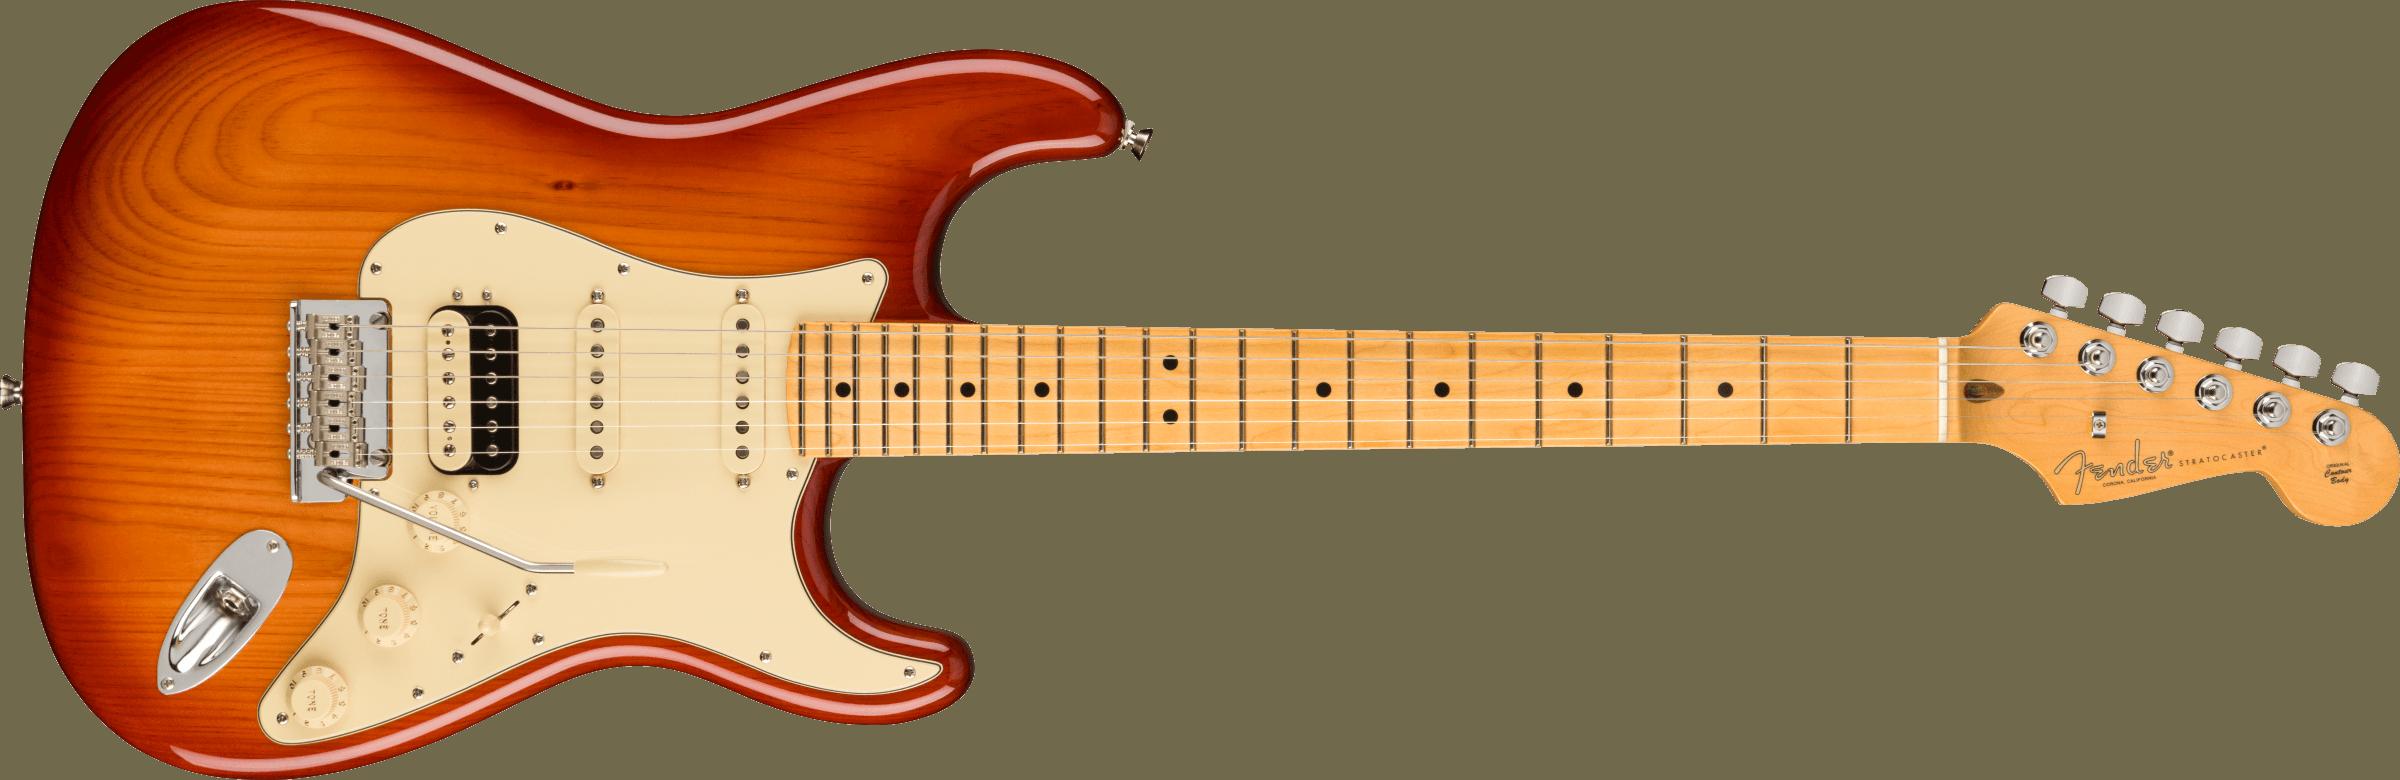 FENDER-American-Professional-II-Stratocaster-HSS-Maple-Fingerboard-Sienna-Sunburst-sku-571005535